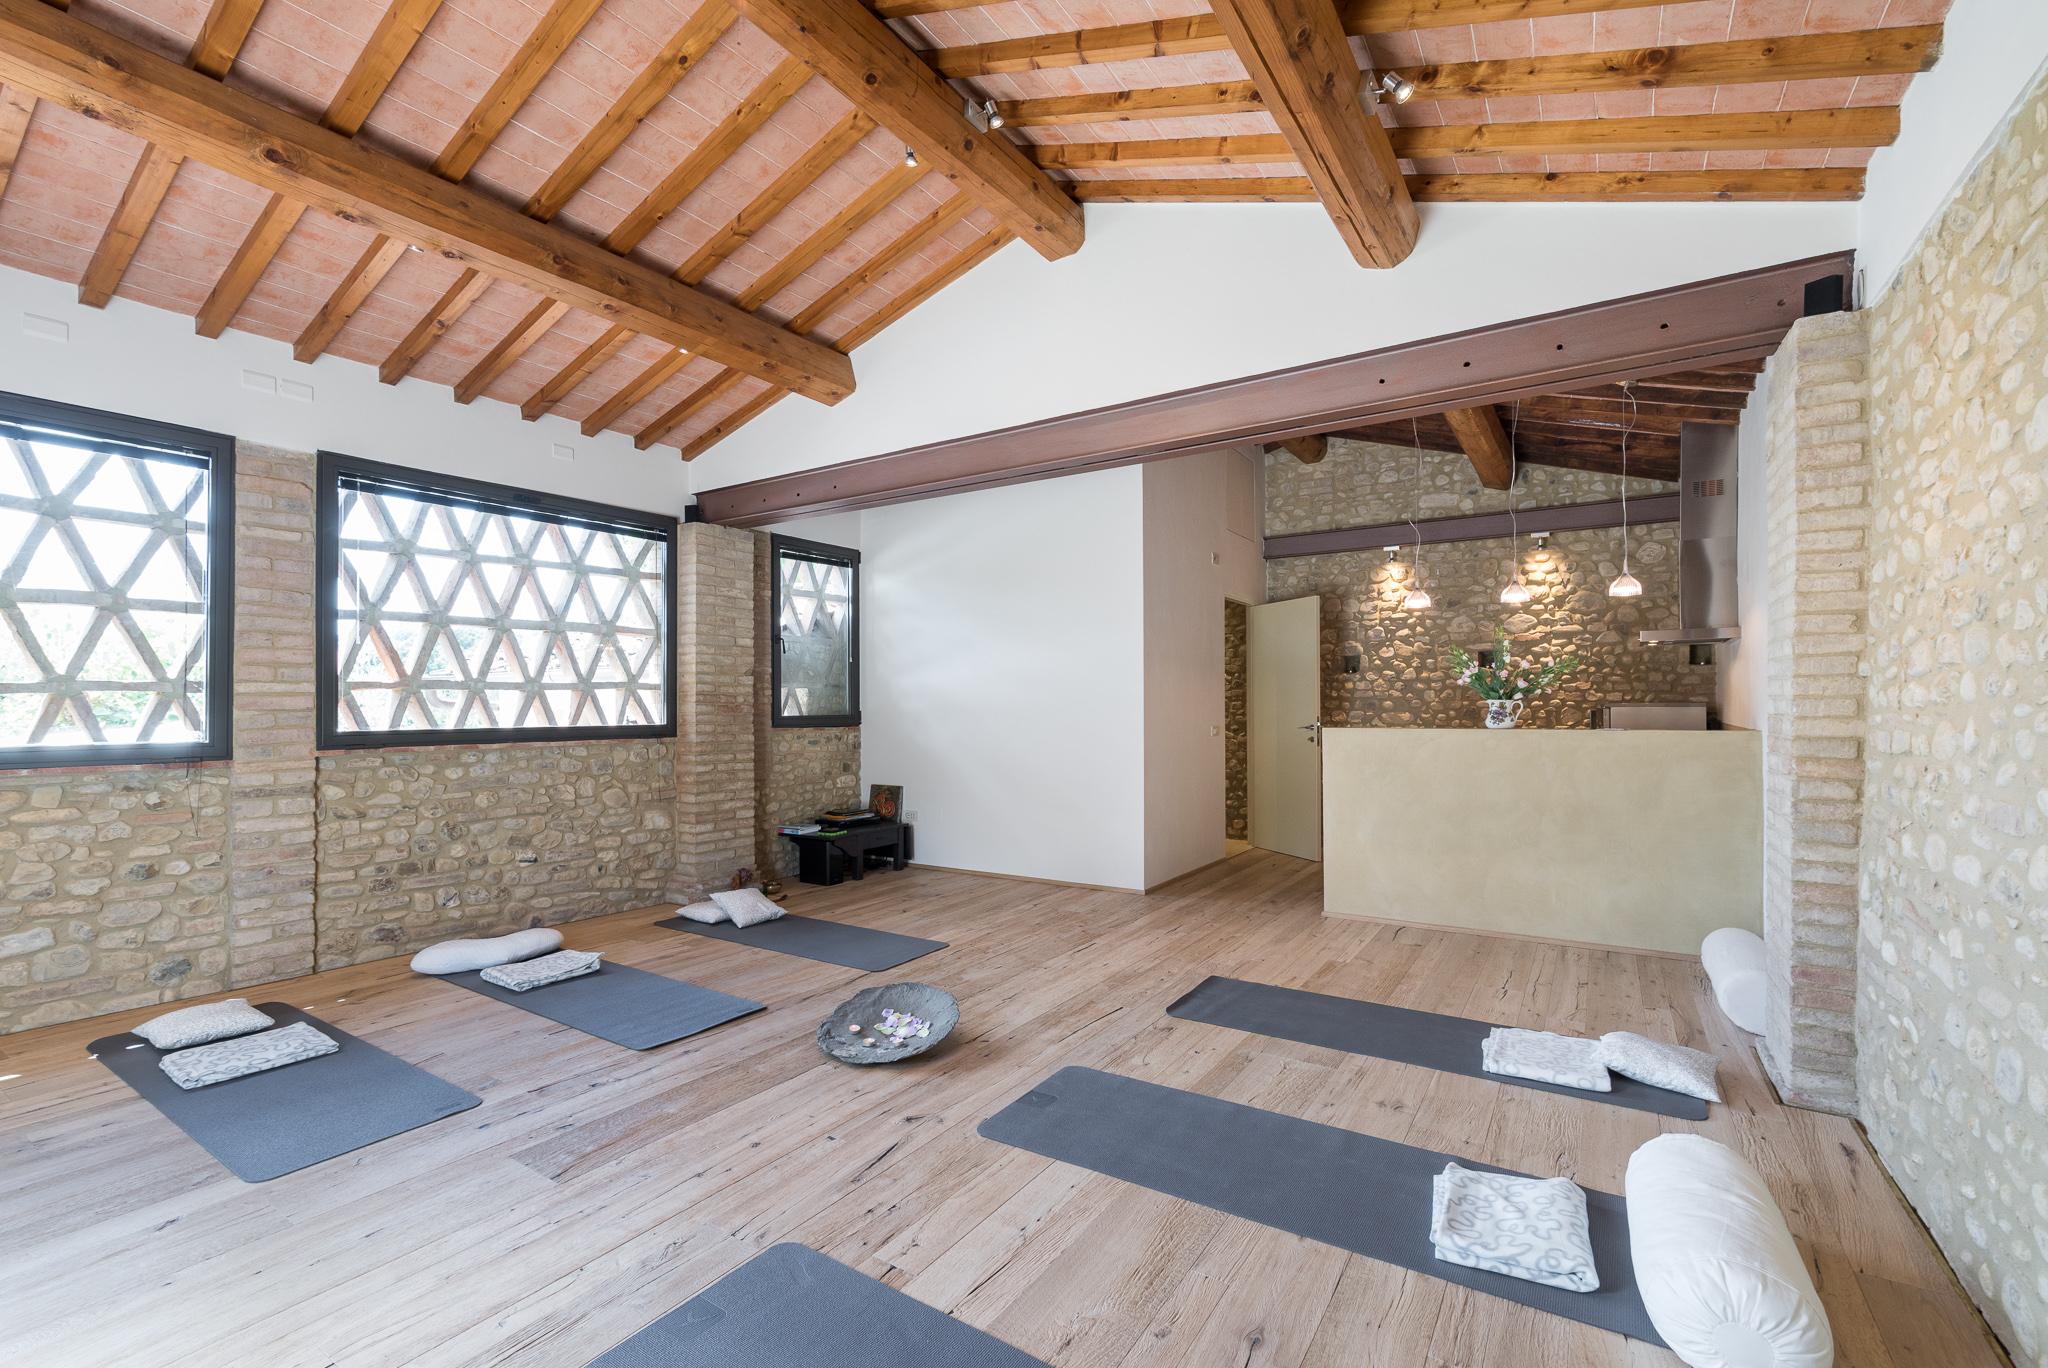 Fienile Yoga Shala